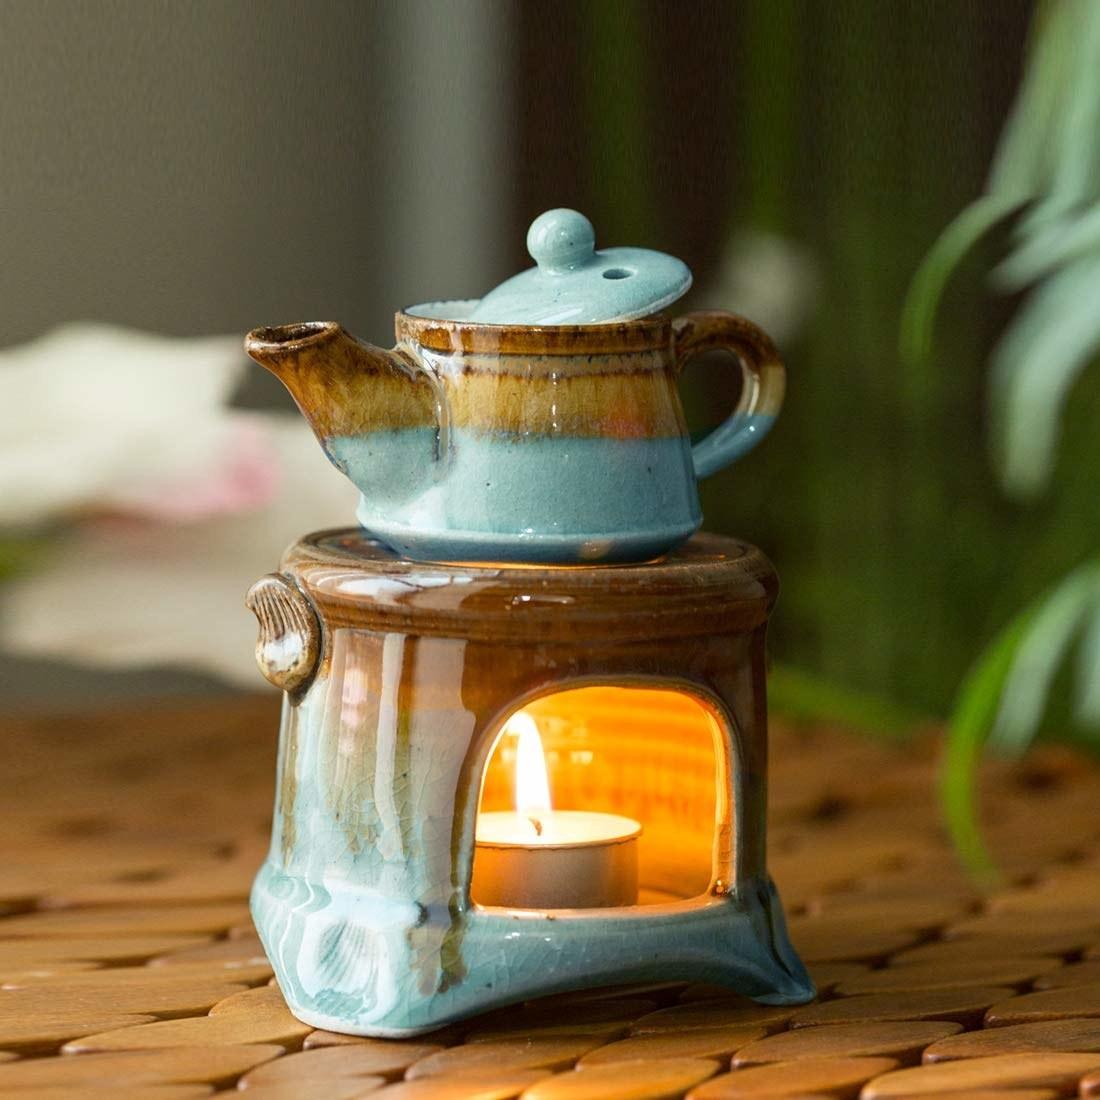 A blue essential oil diffuser